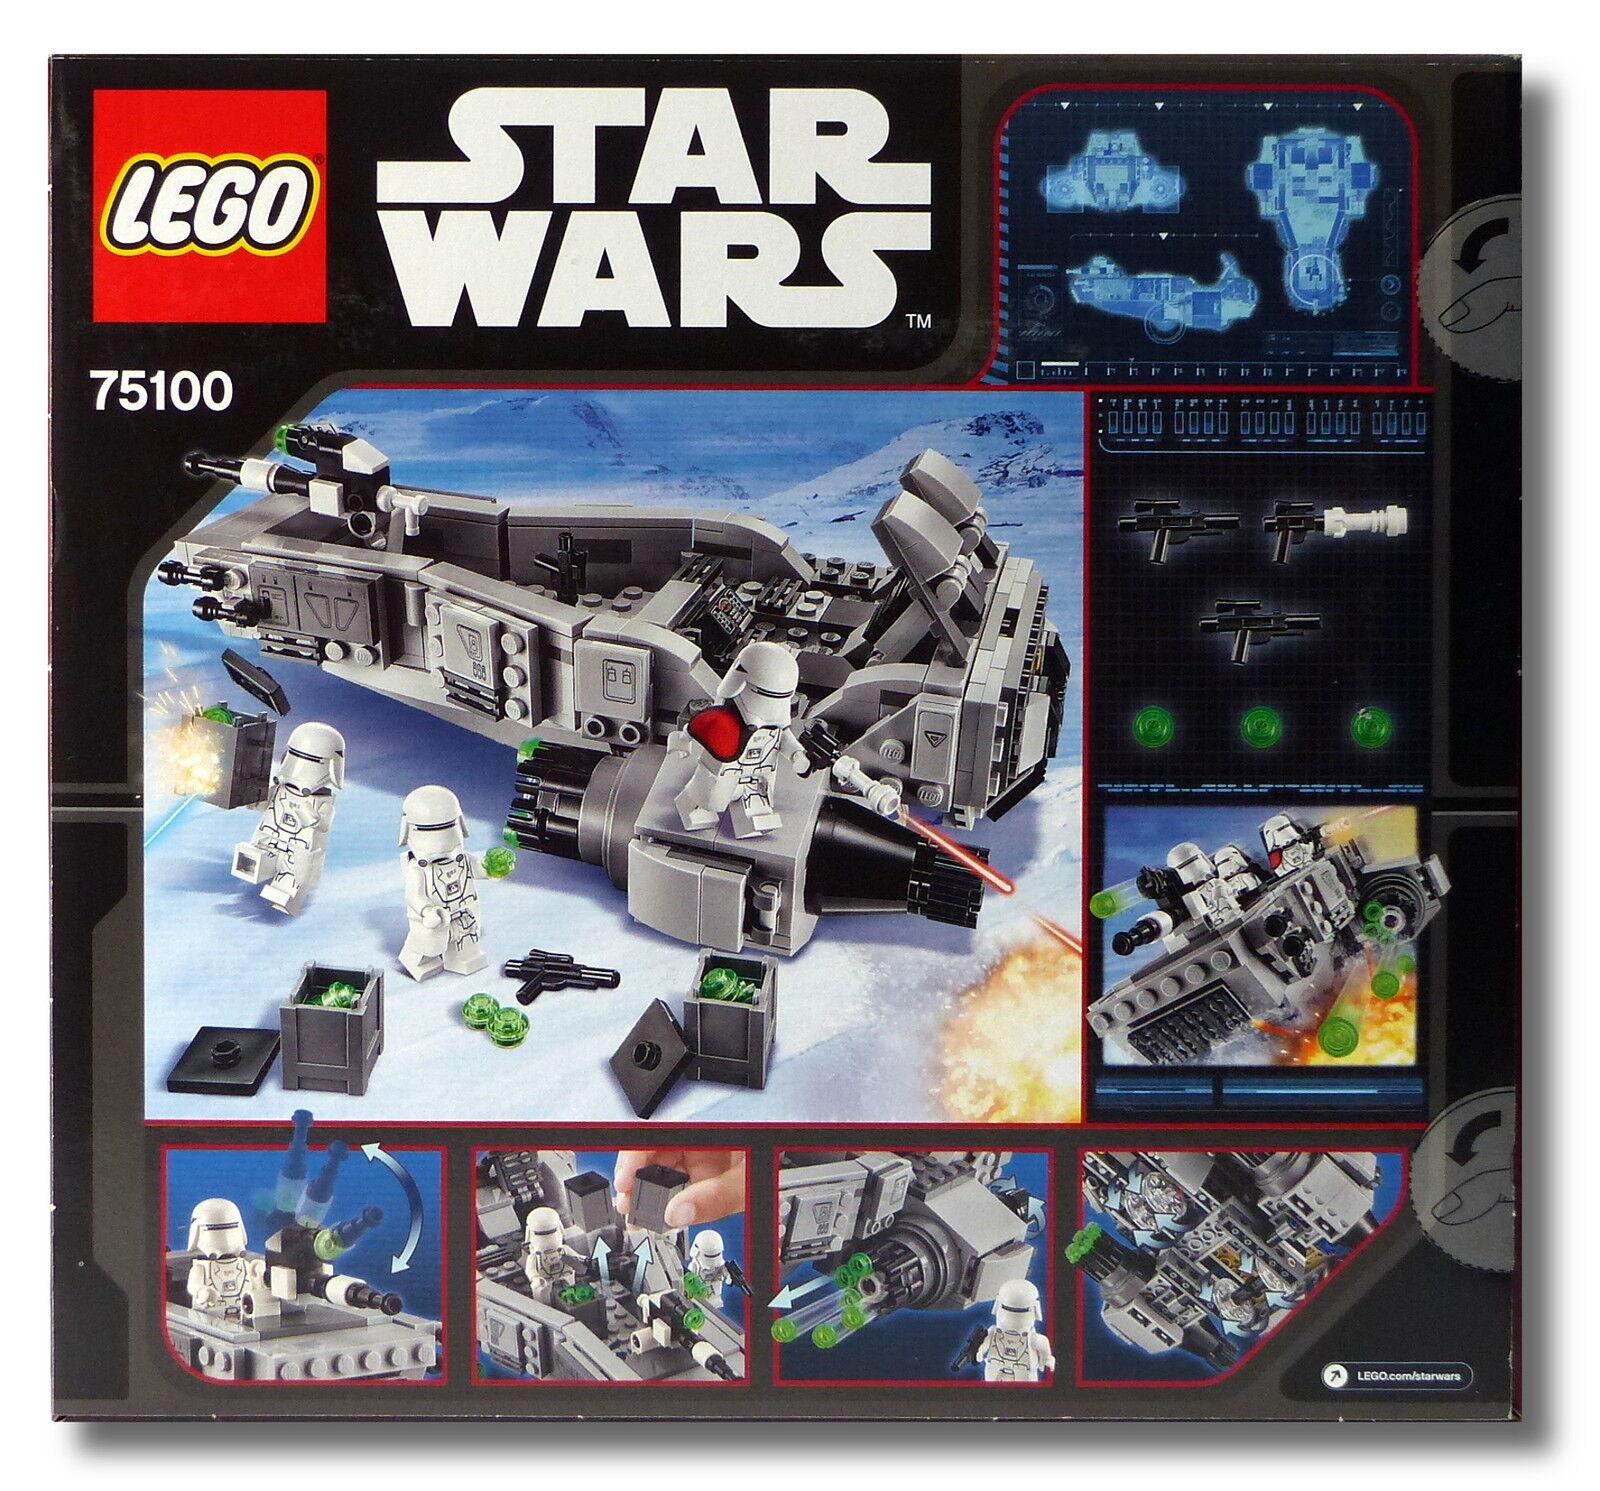 LEGO ® ® ® Star Wars ™ 75100 First Order Snowspeeder ™ Nouveau Neuf dans sa boîte New En parfait état, dans sa boîte scellée ecca03